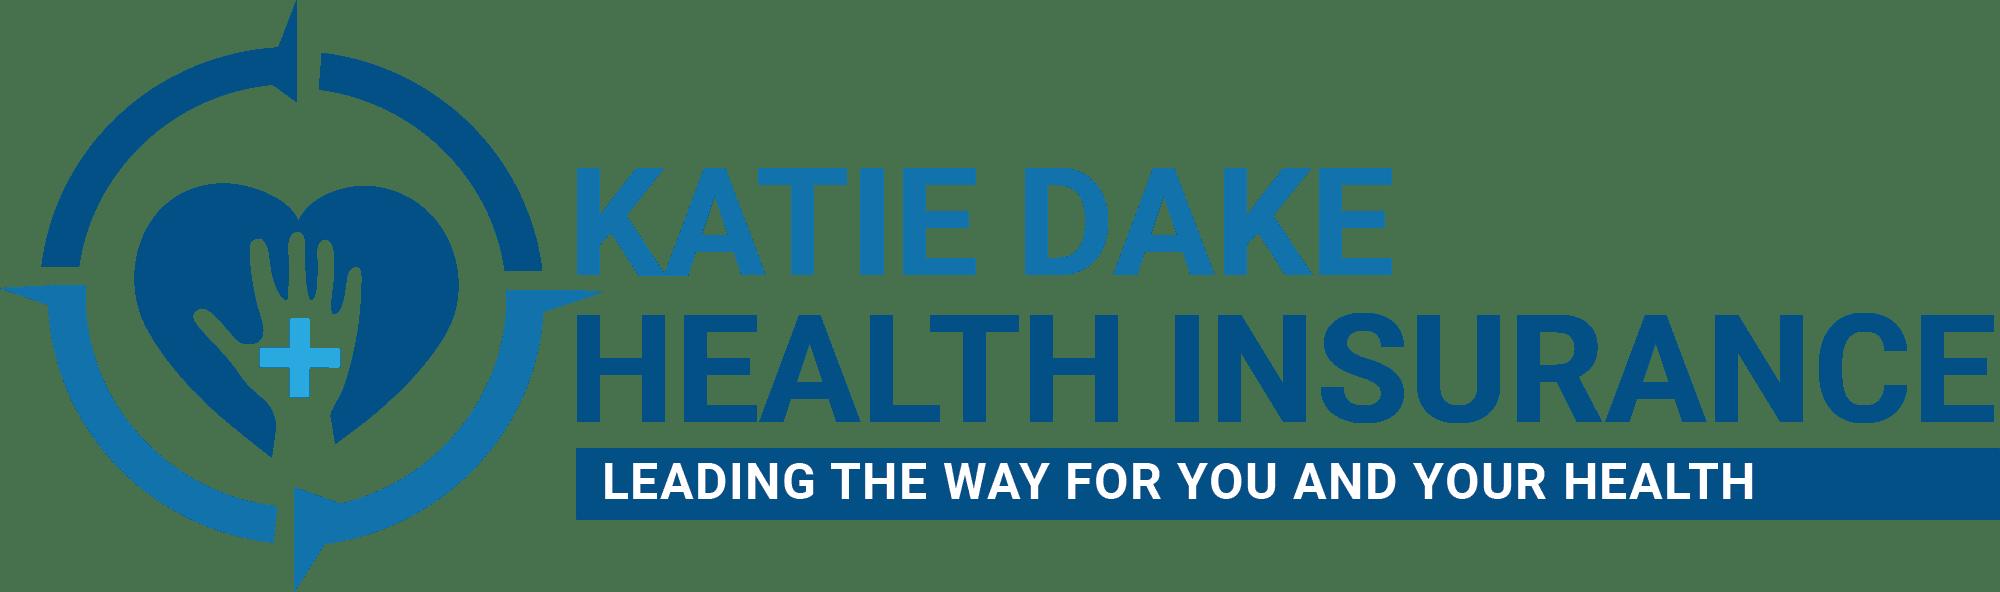 Katie Dake Health Insurance